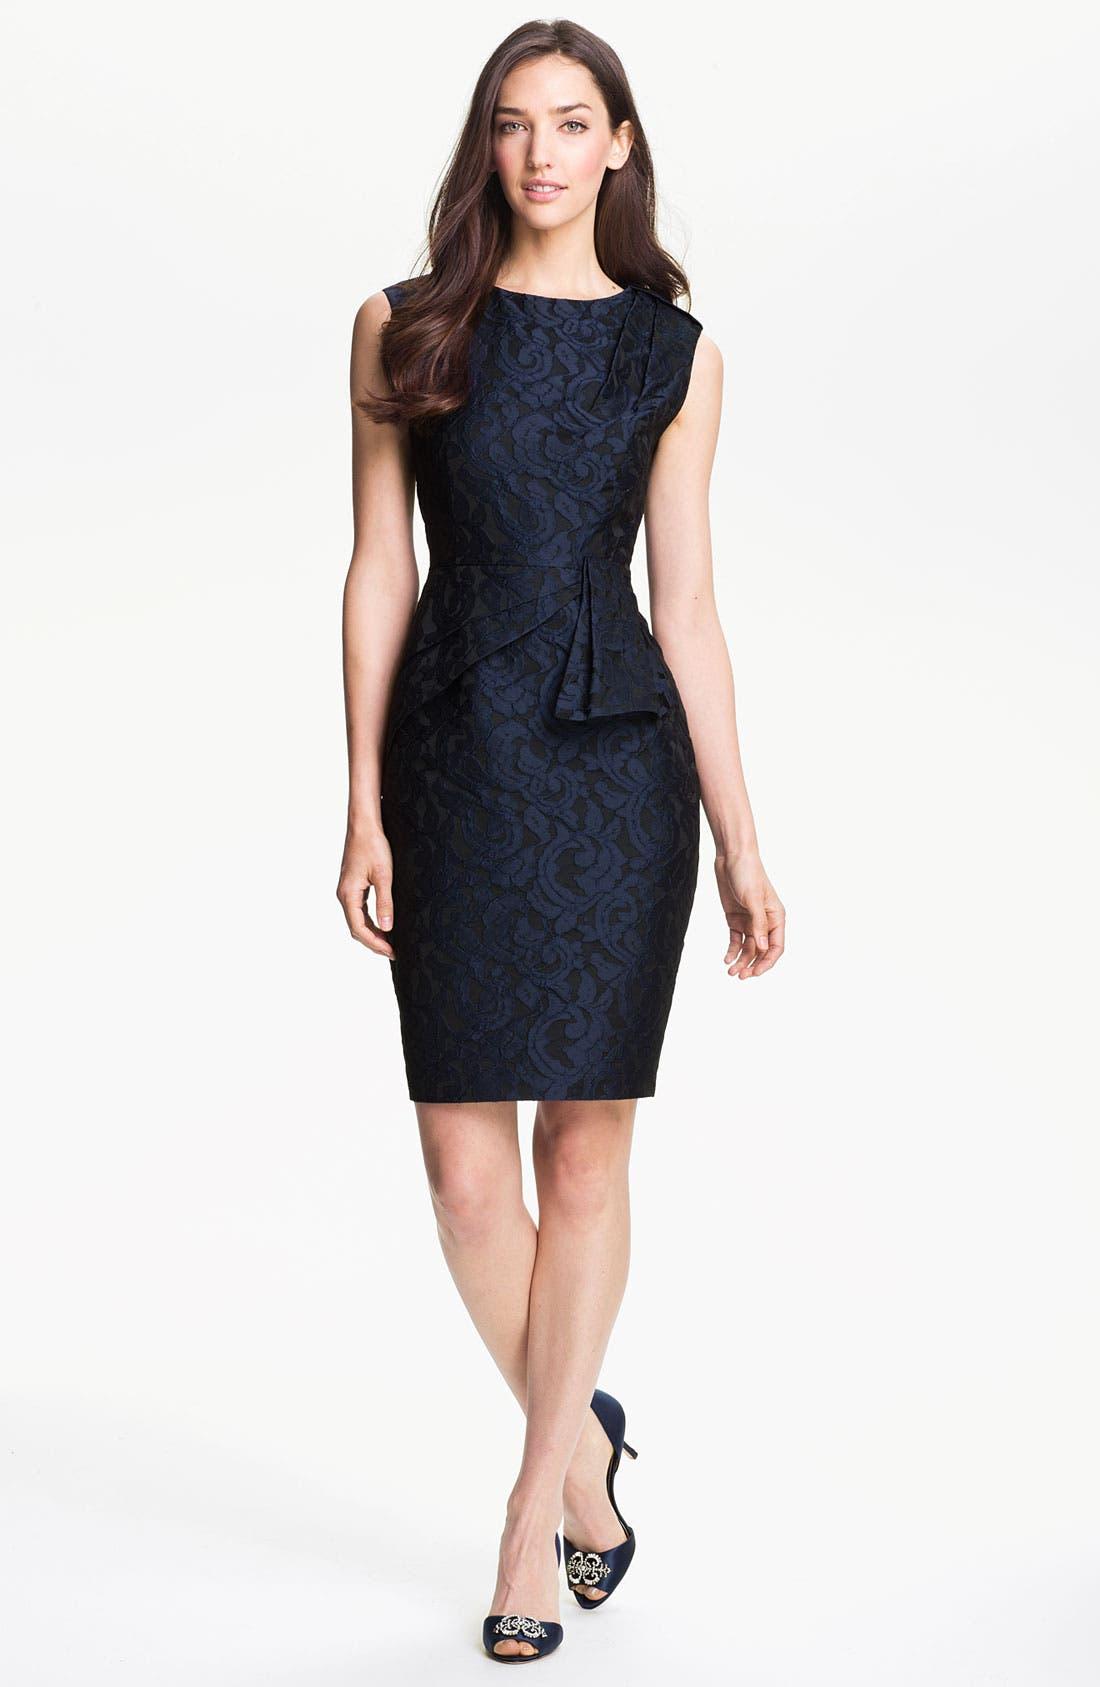 Alternate Image 1 Selected - Adrianna Papell Side Peplum Jacquard Sheath Dress